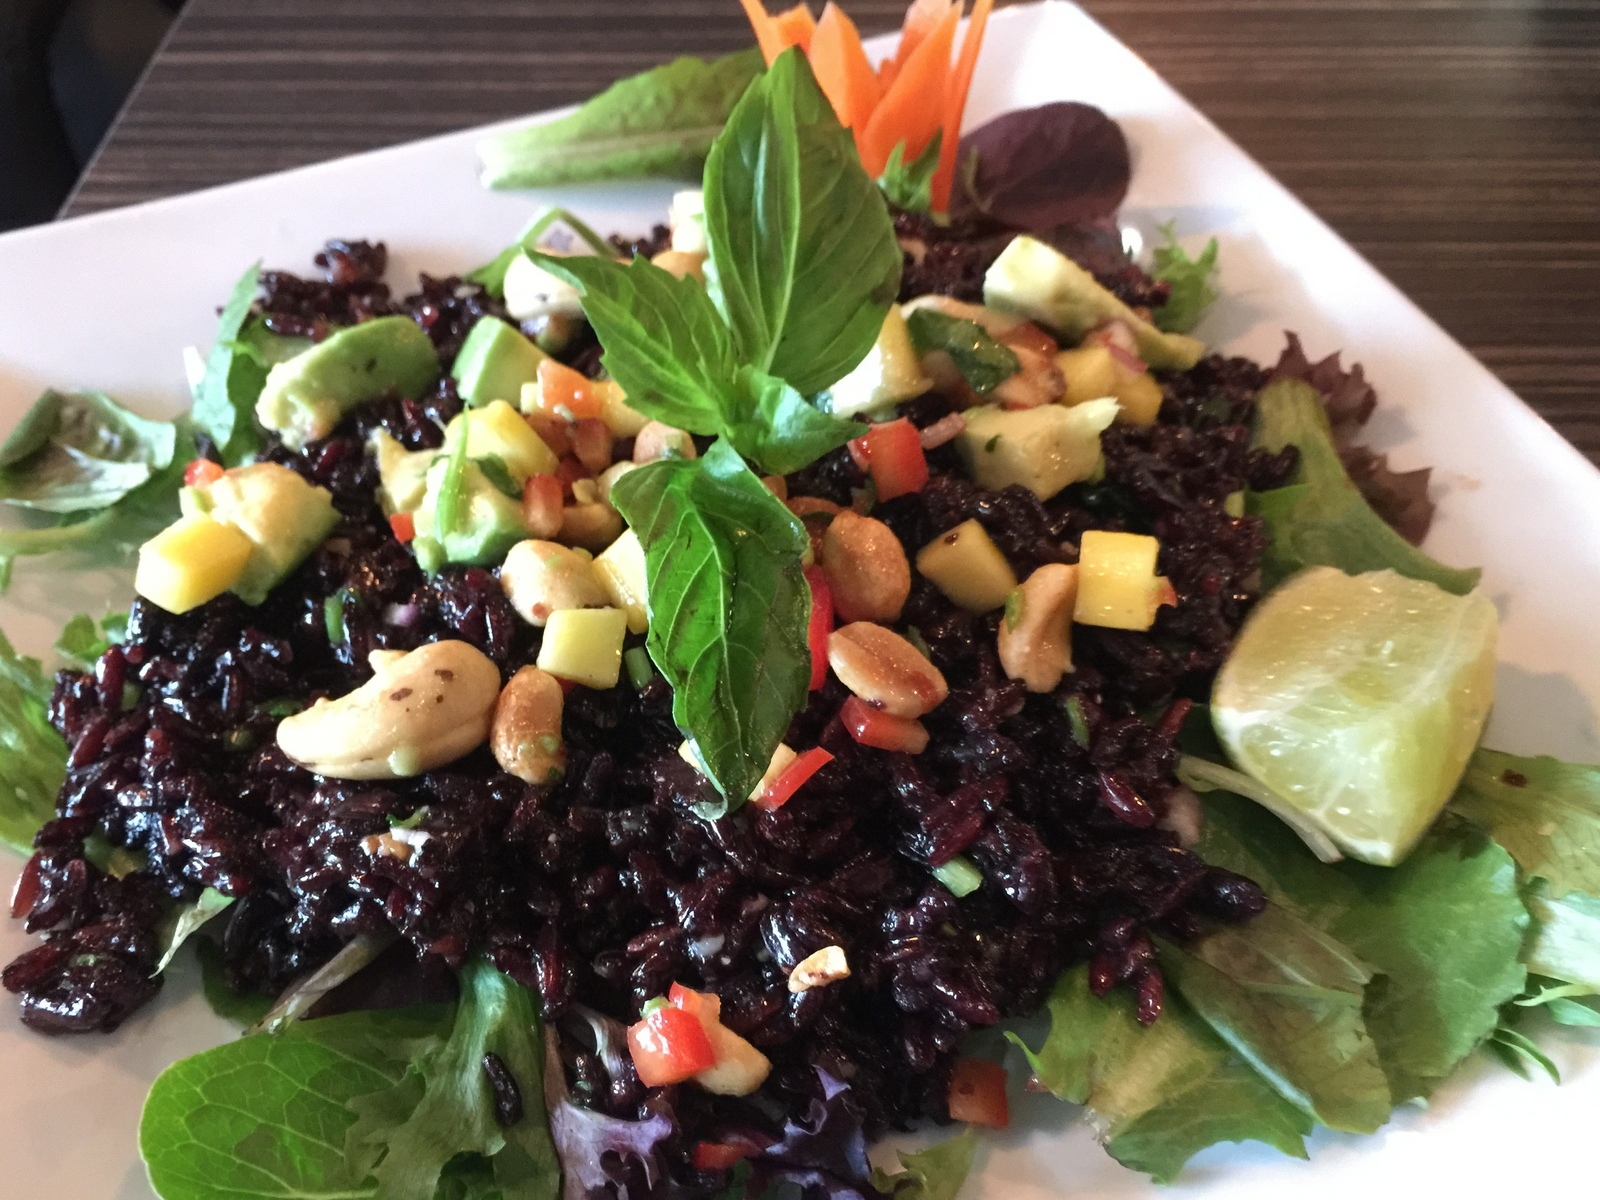 Black rice salad with avocado, mango and cashews at Sun Williamsville. (Andrew Galarneau/Buffalo News)